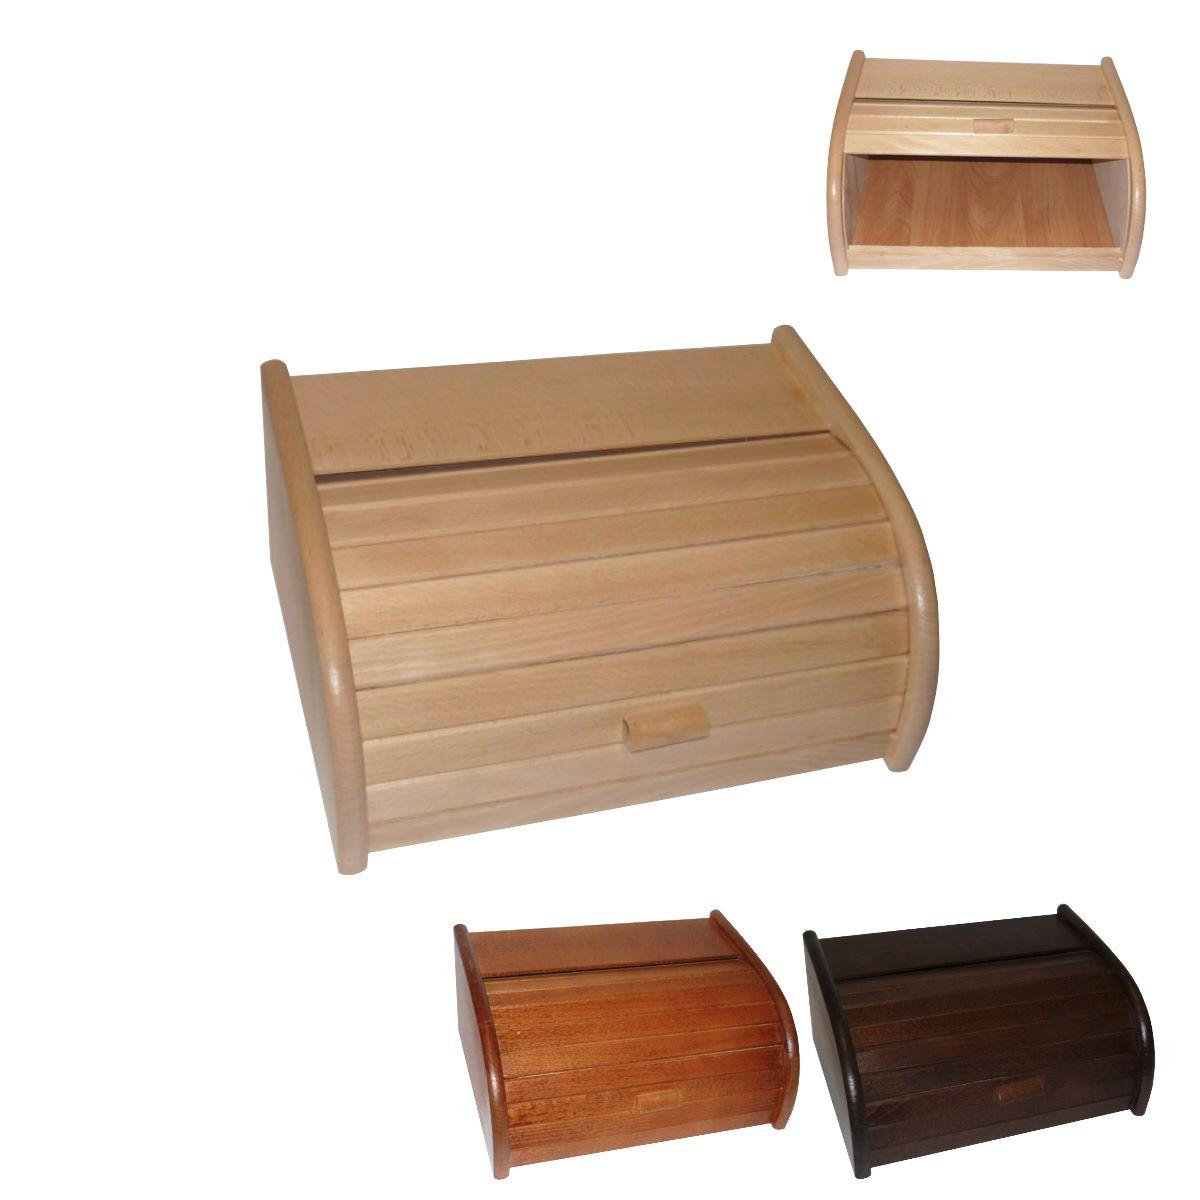 Chlebovka dřevo lak 40x27,5x18,5cm  WOOD, mix barev